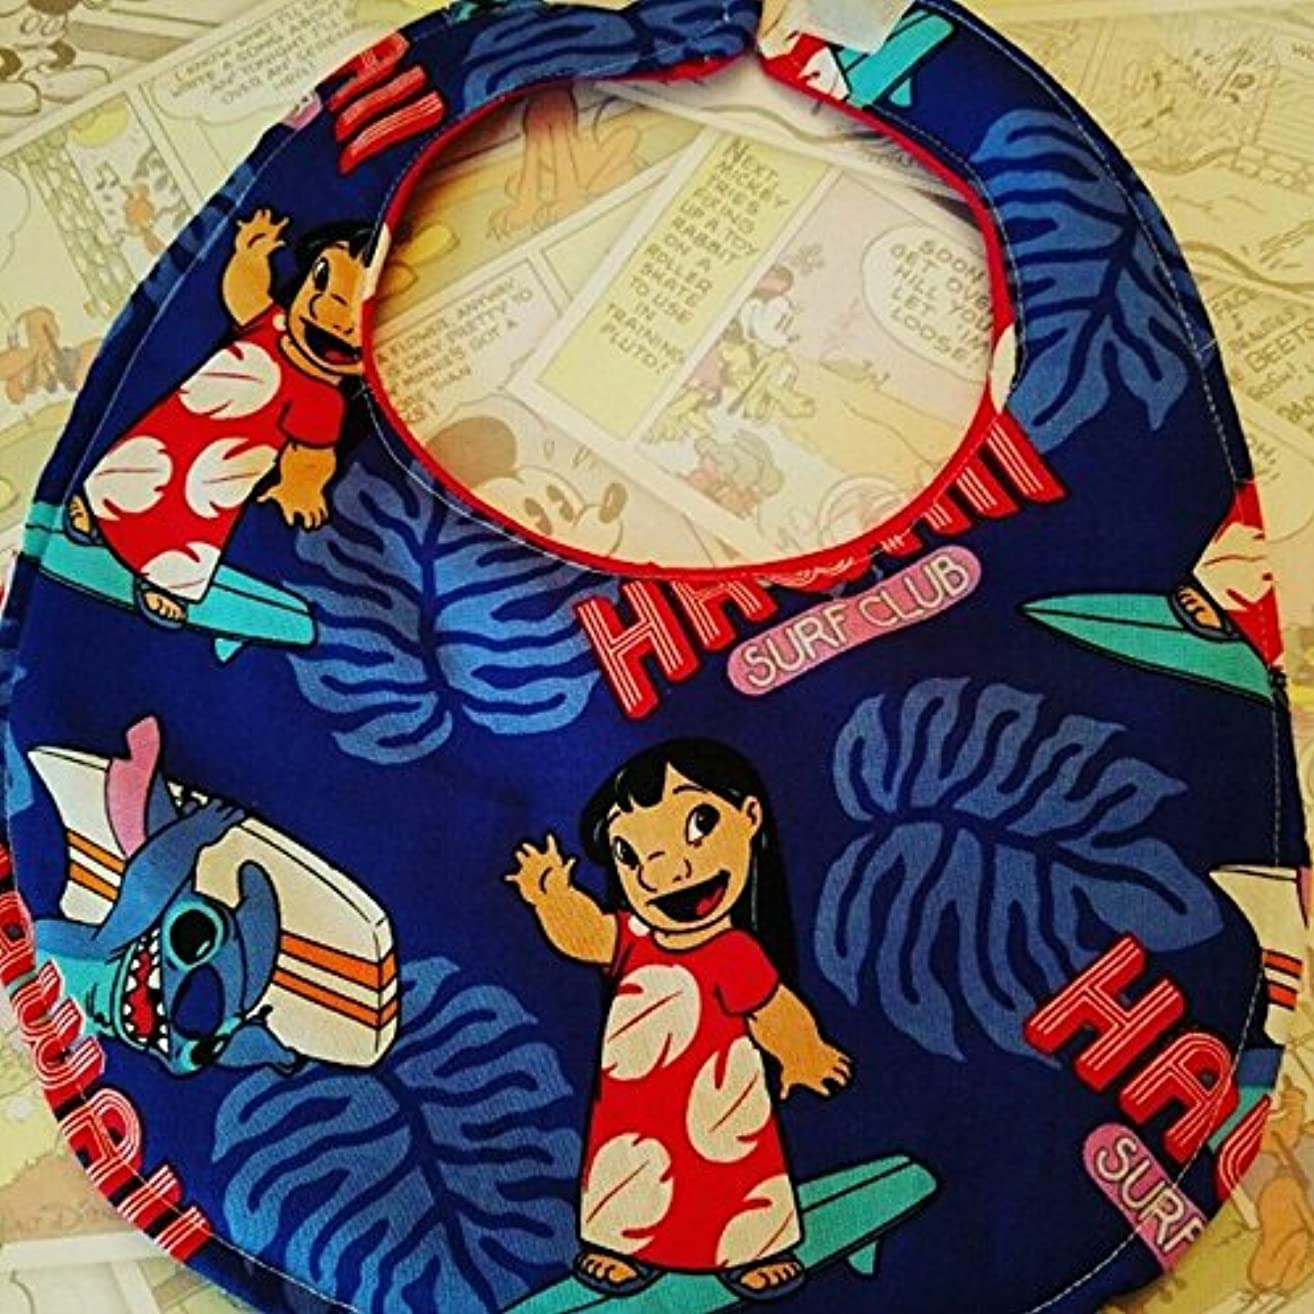 Disney Lilo and Stitch baby bib, disney cruise, hawaii, disneybound, baby bib, unisex bib